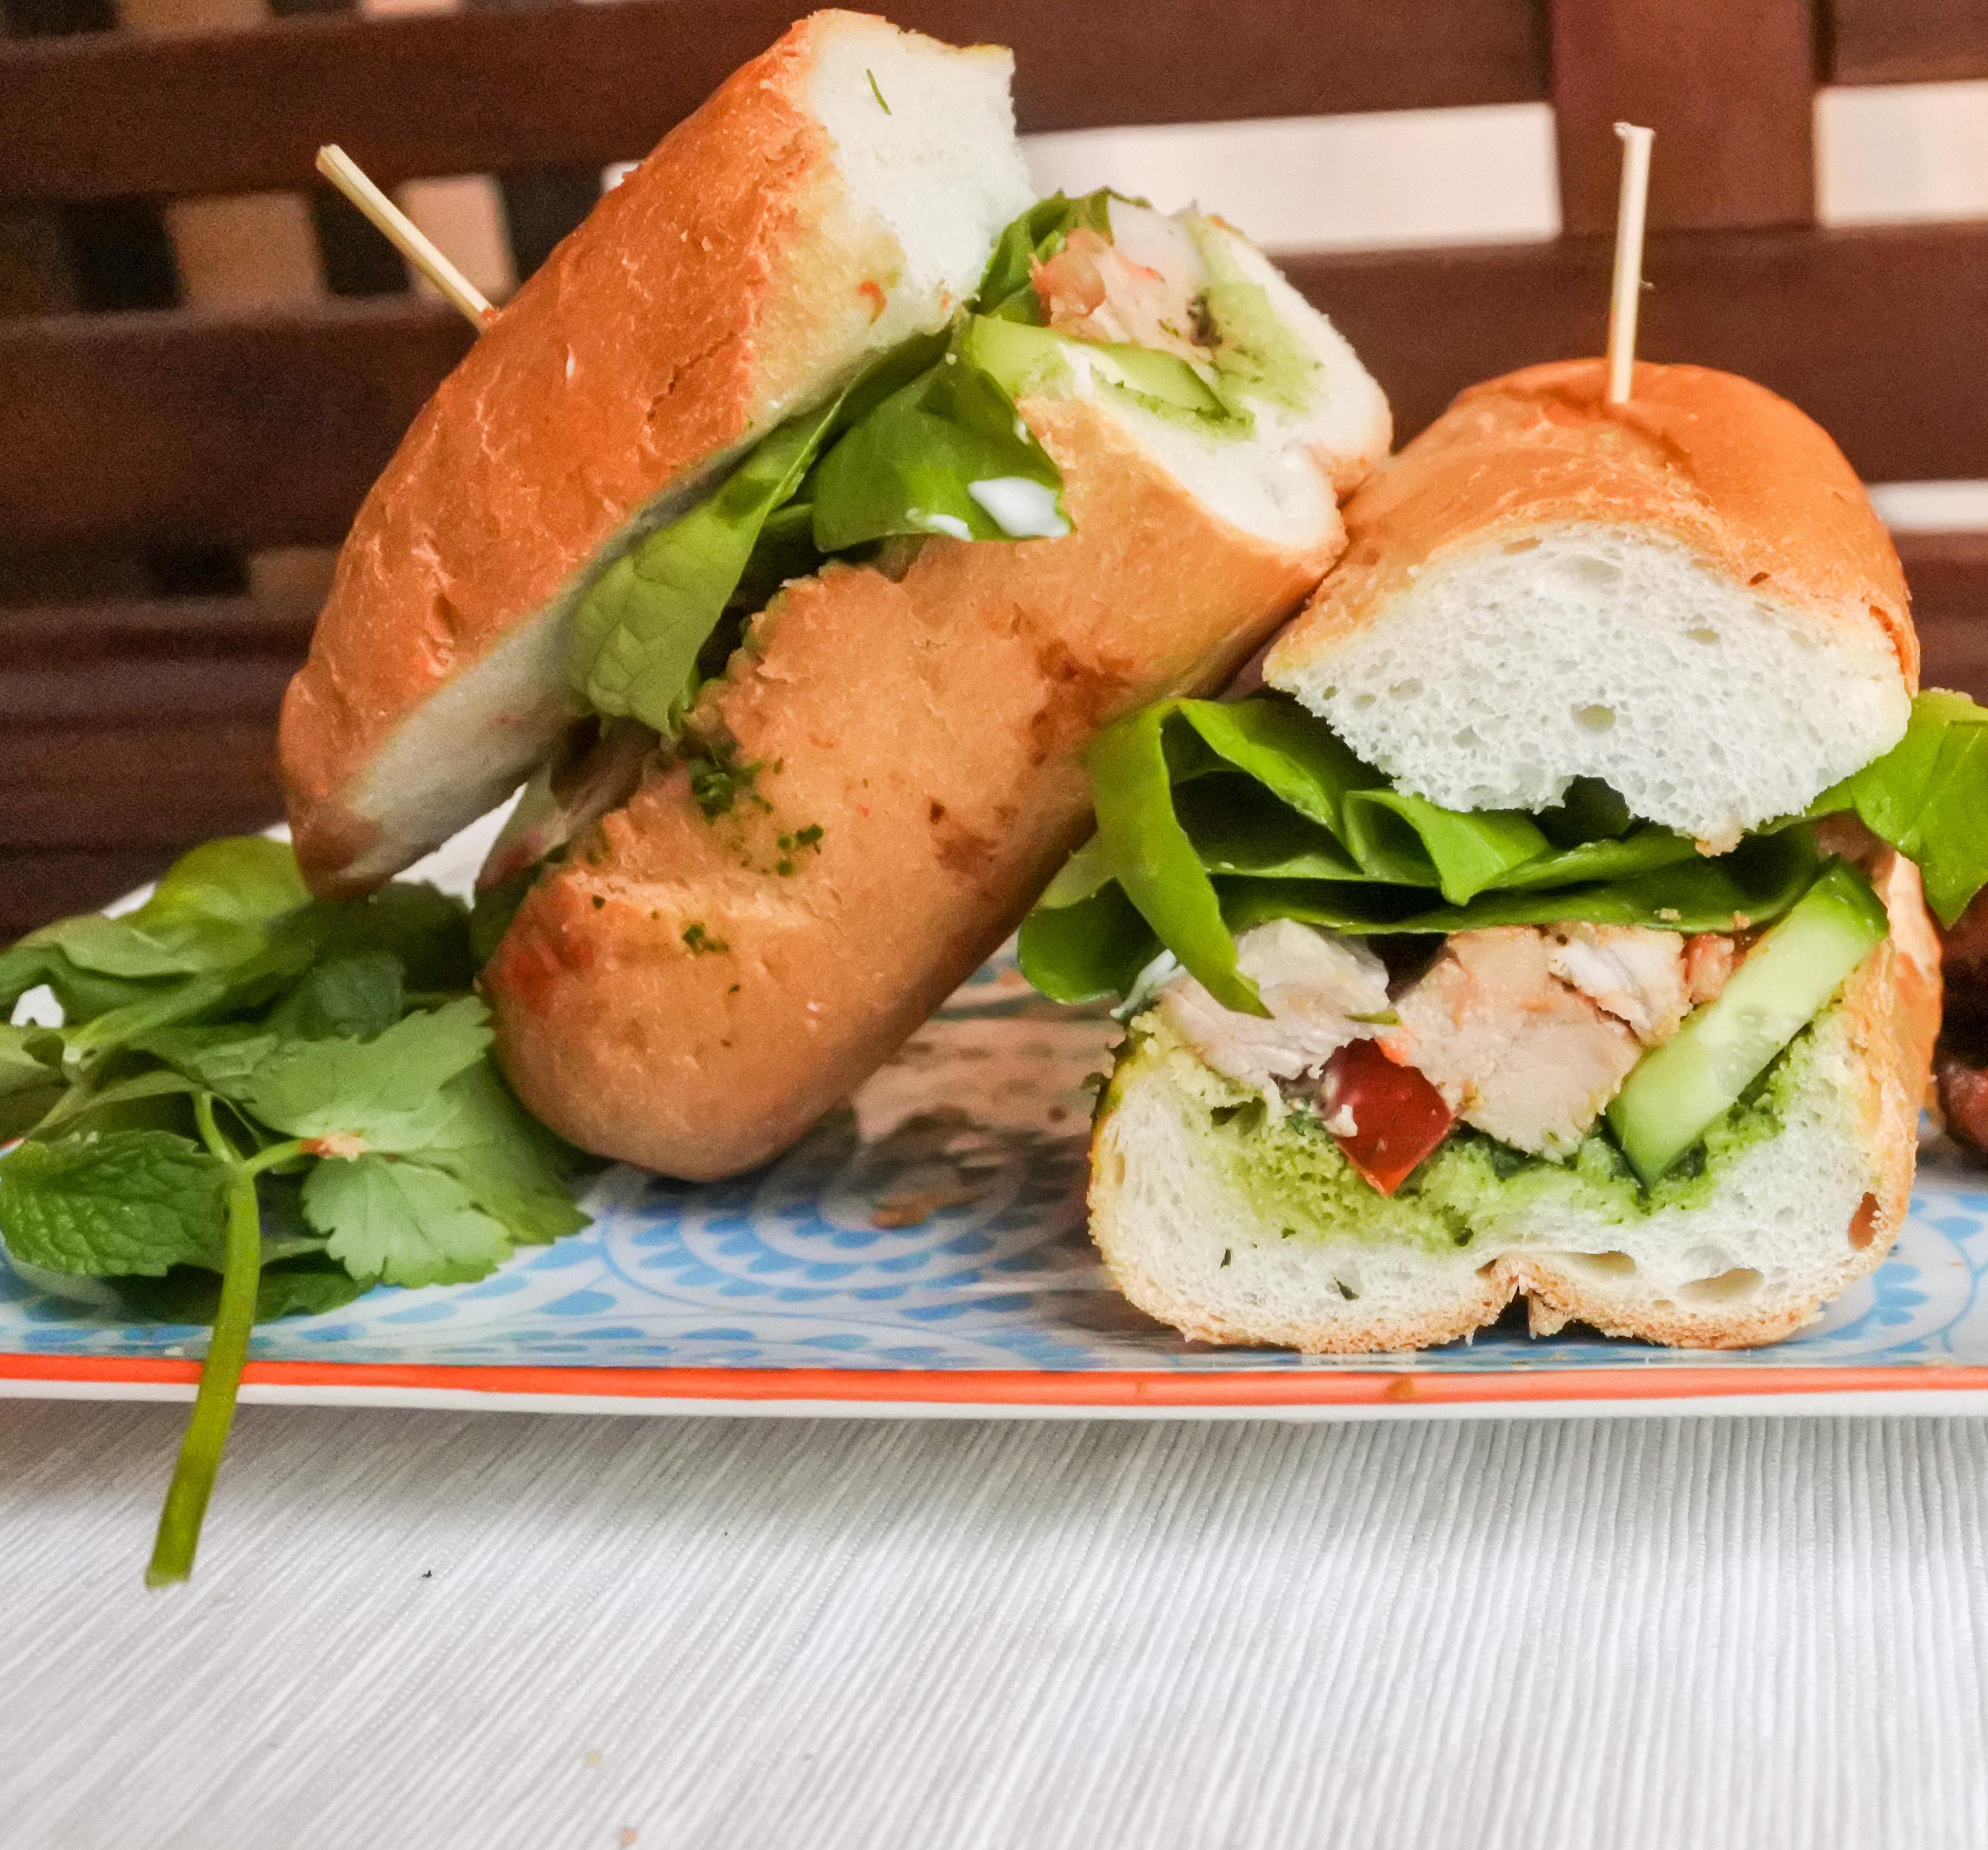 Pork Banh Mi (Vietnamese Pork Sandwich)